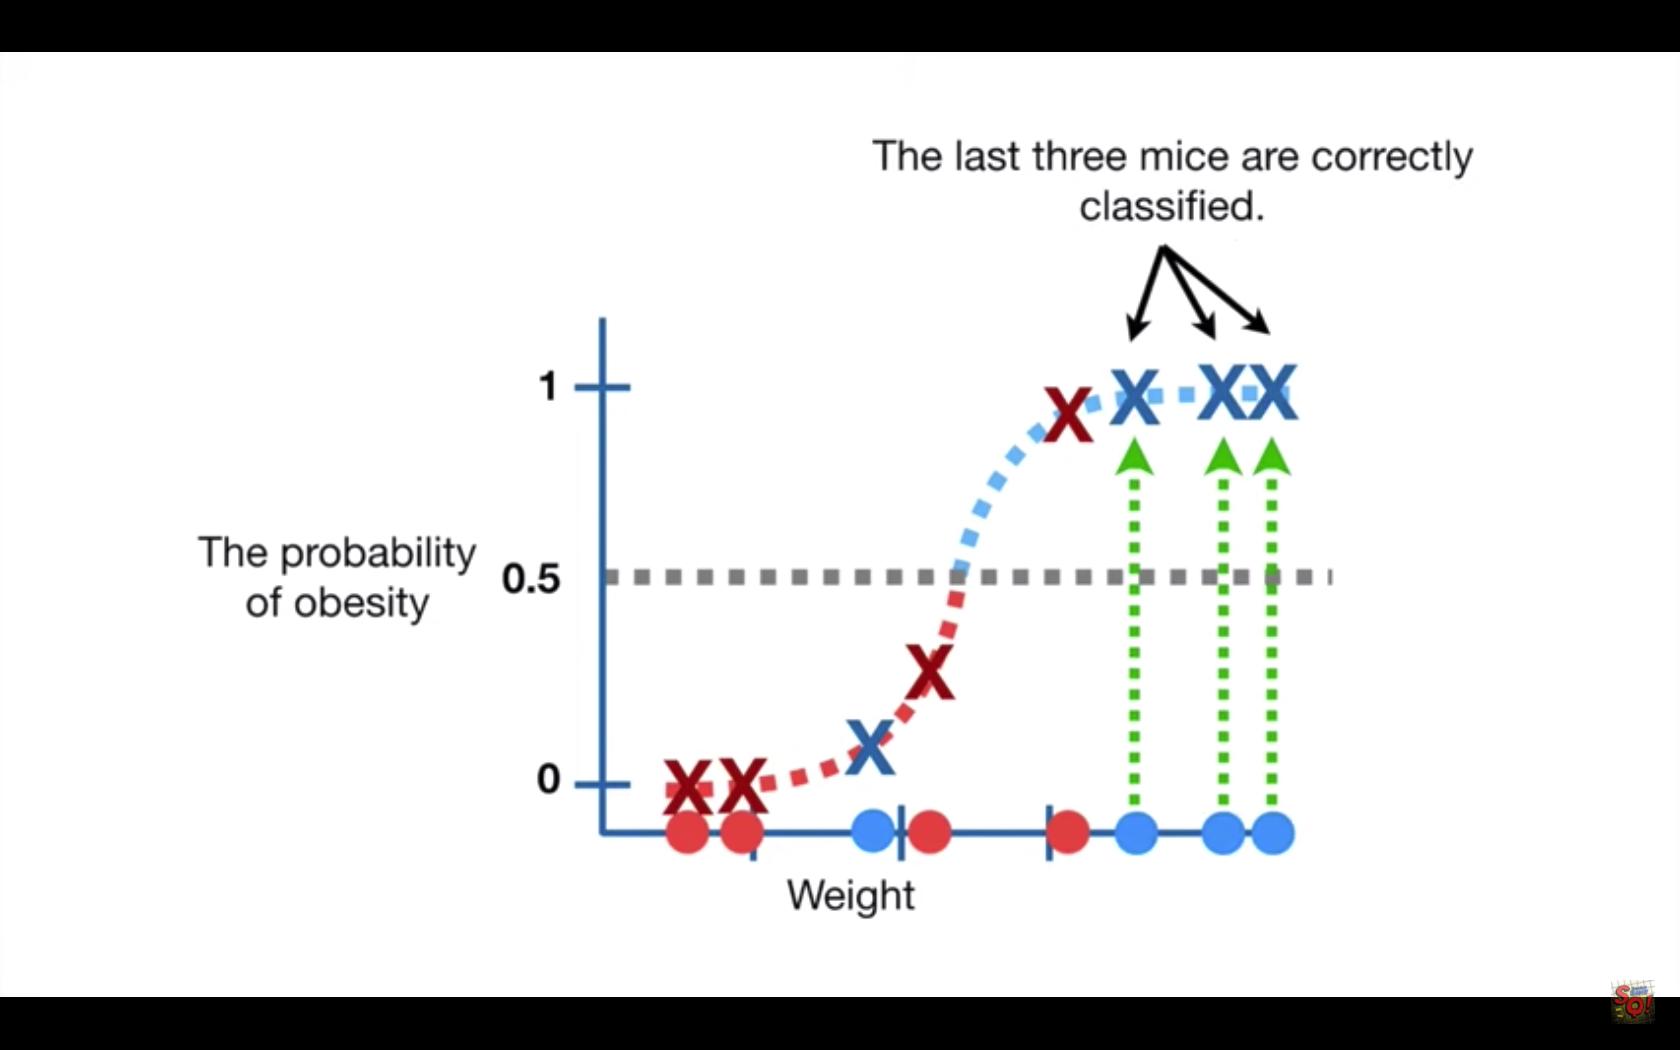 classification-roc-1680x1050